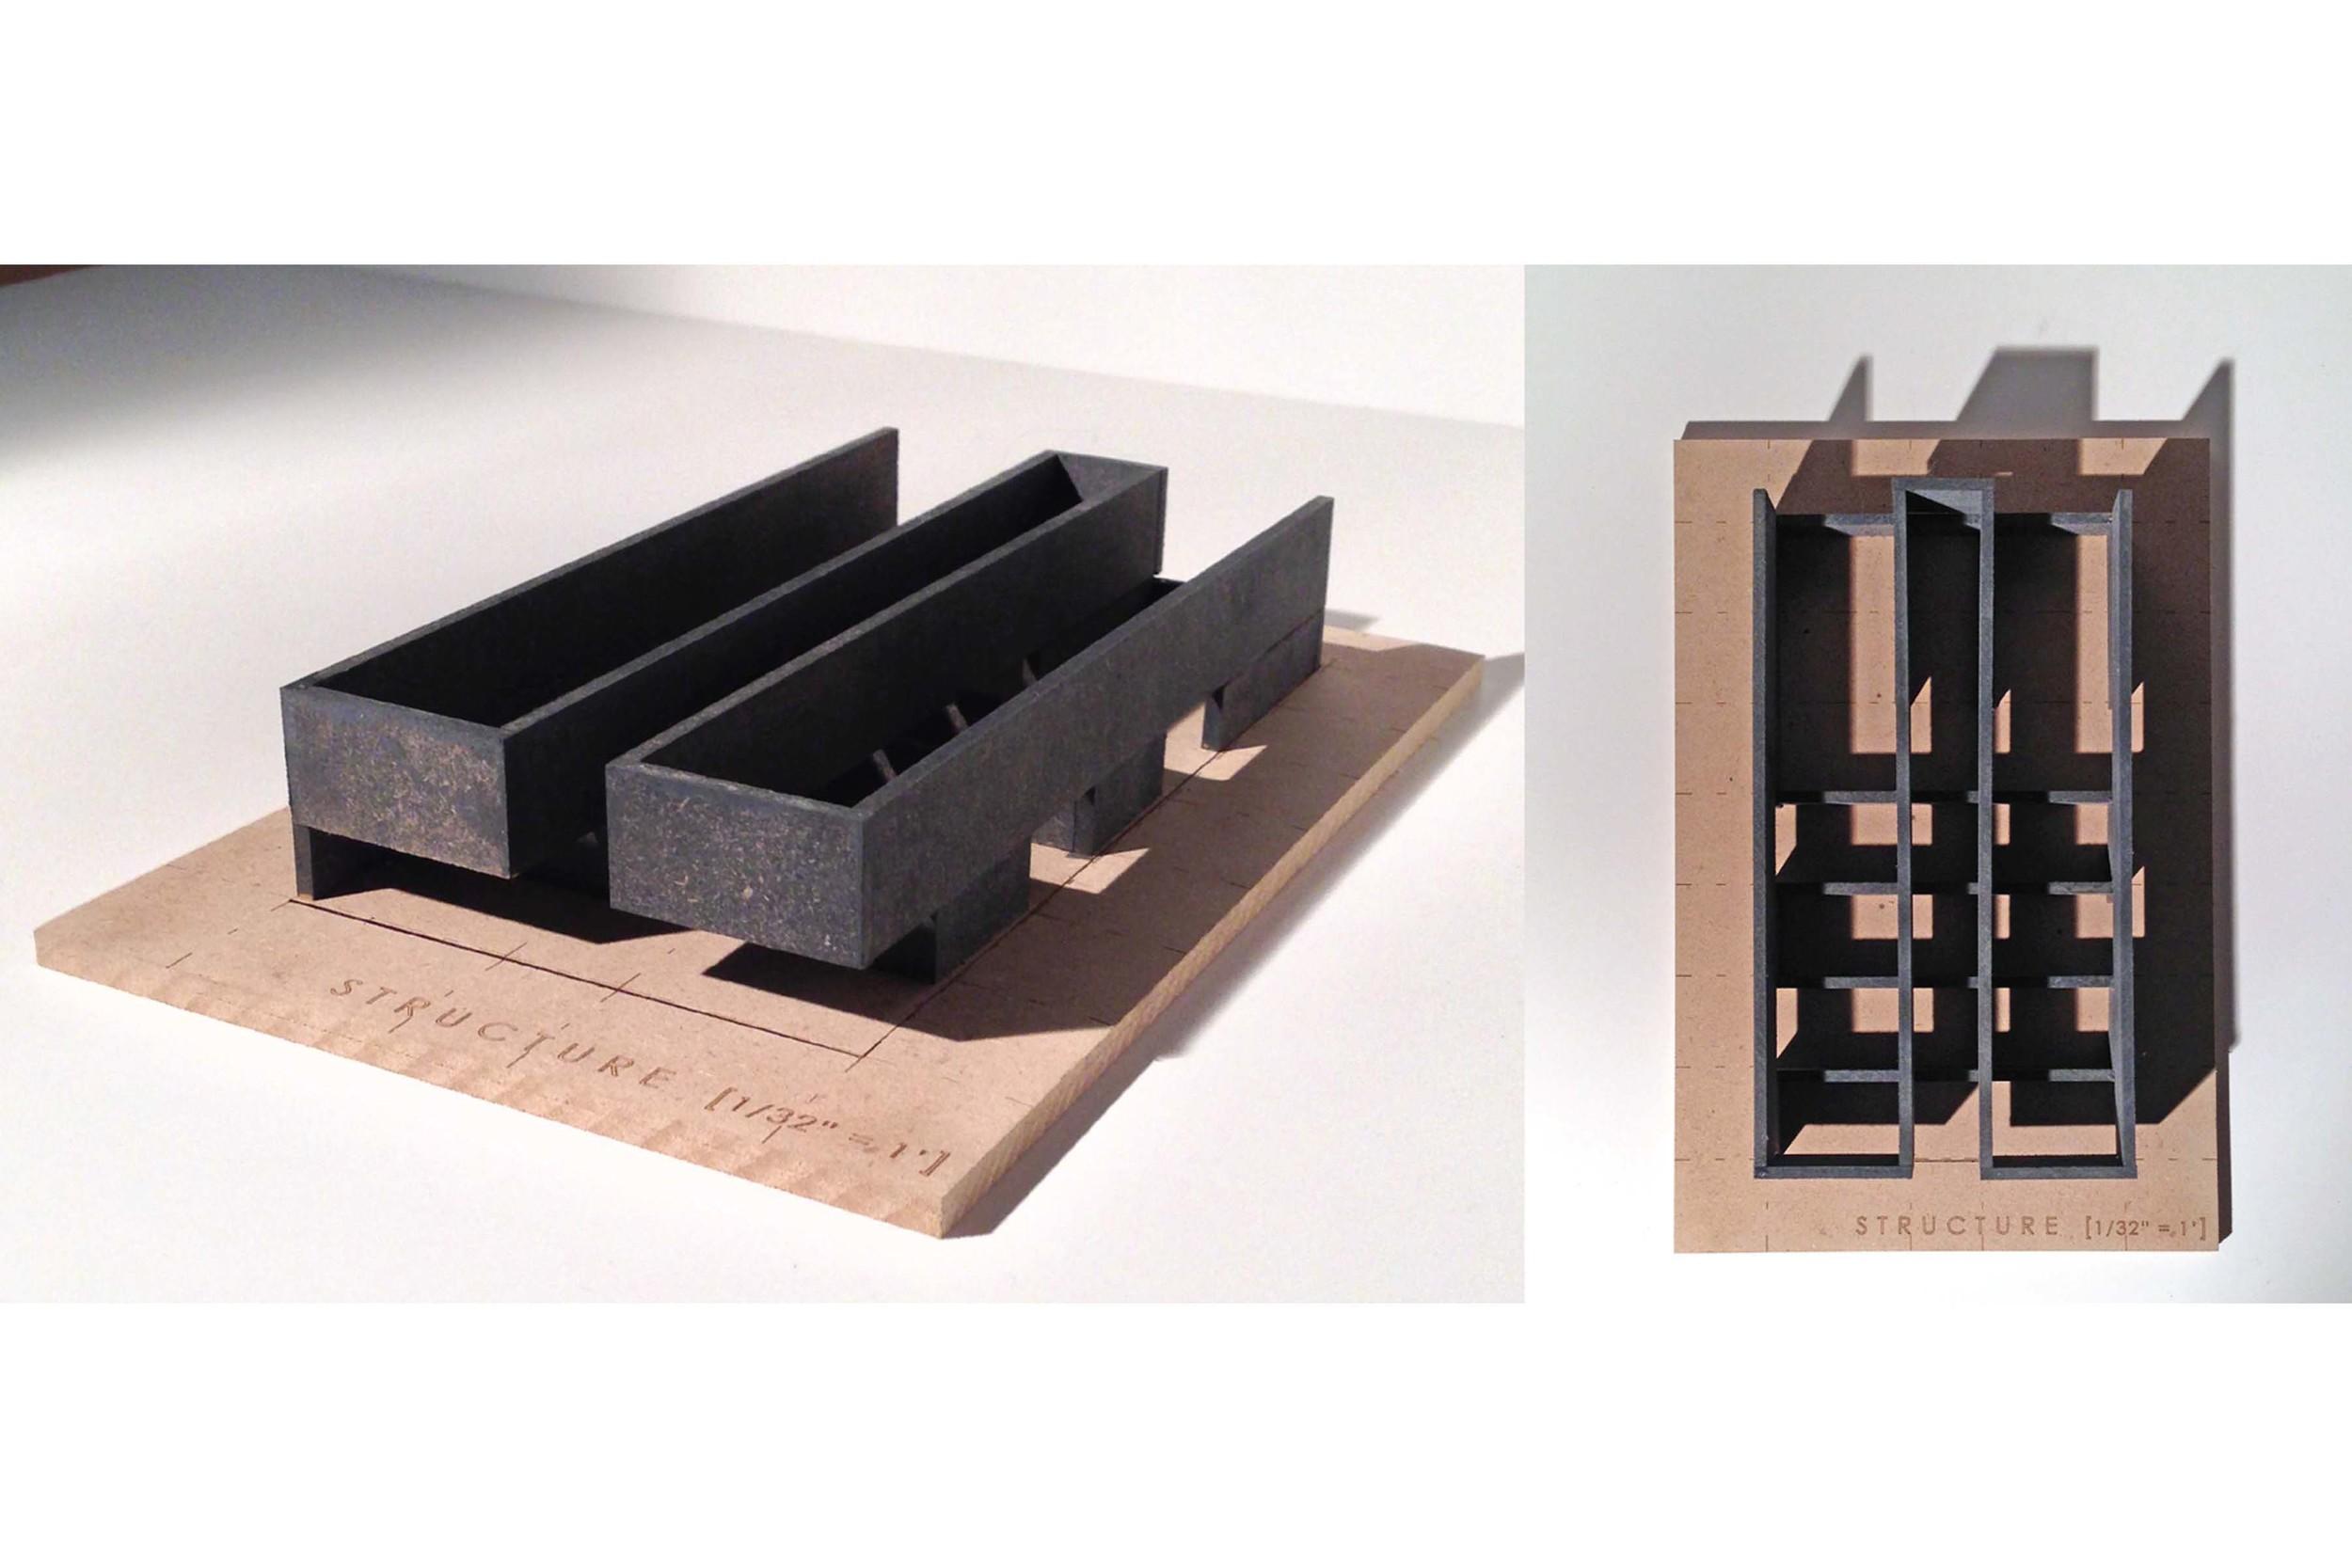 Concept Model: Structure